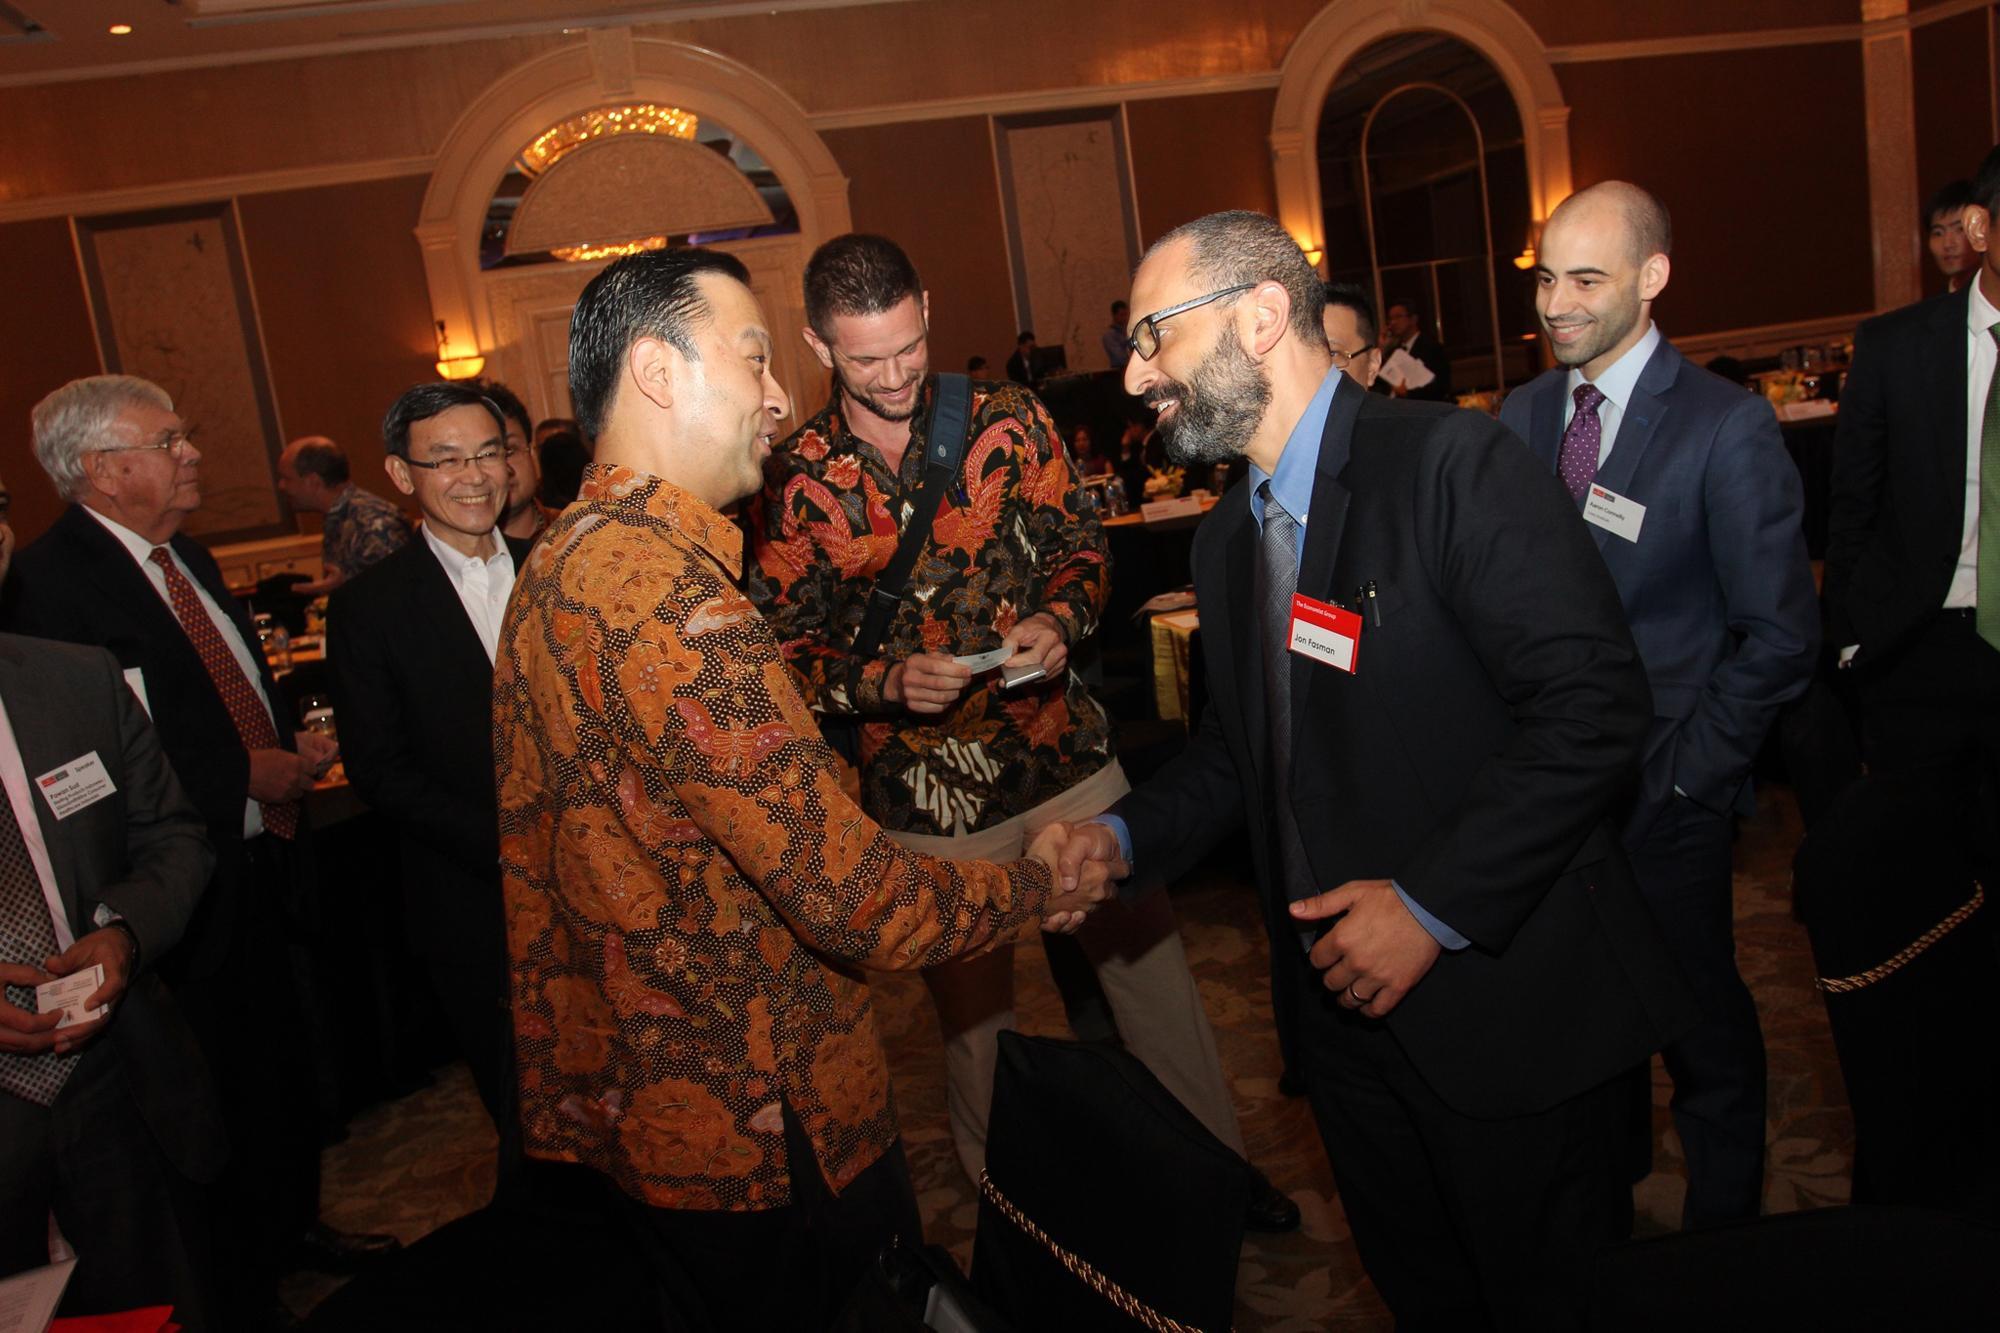 Menteri Perdagangan, Tom Lembong dan Jon Fasman, South -East Asia bureau, Asia -Pacific, The Economist, Jon Fasman, seusai acara diskusi pada acara Indonesia Summit 2016 di Jakarta, Kamis, (24/02).